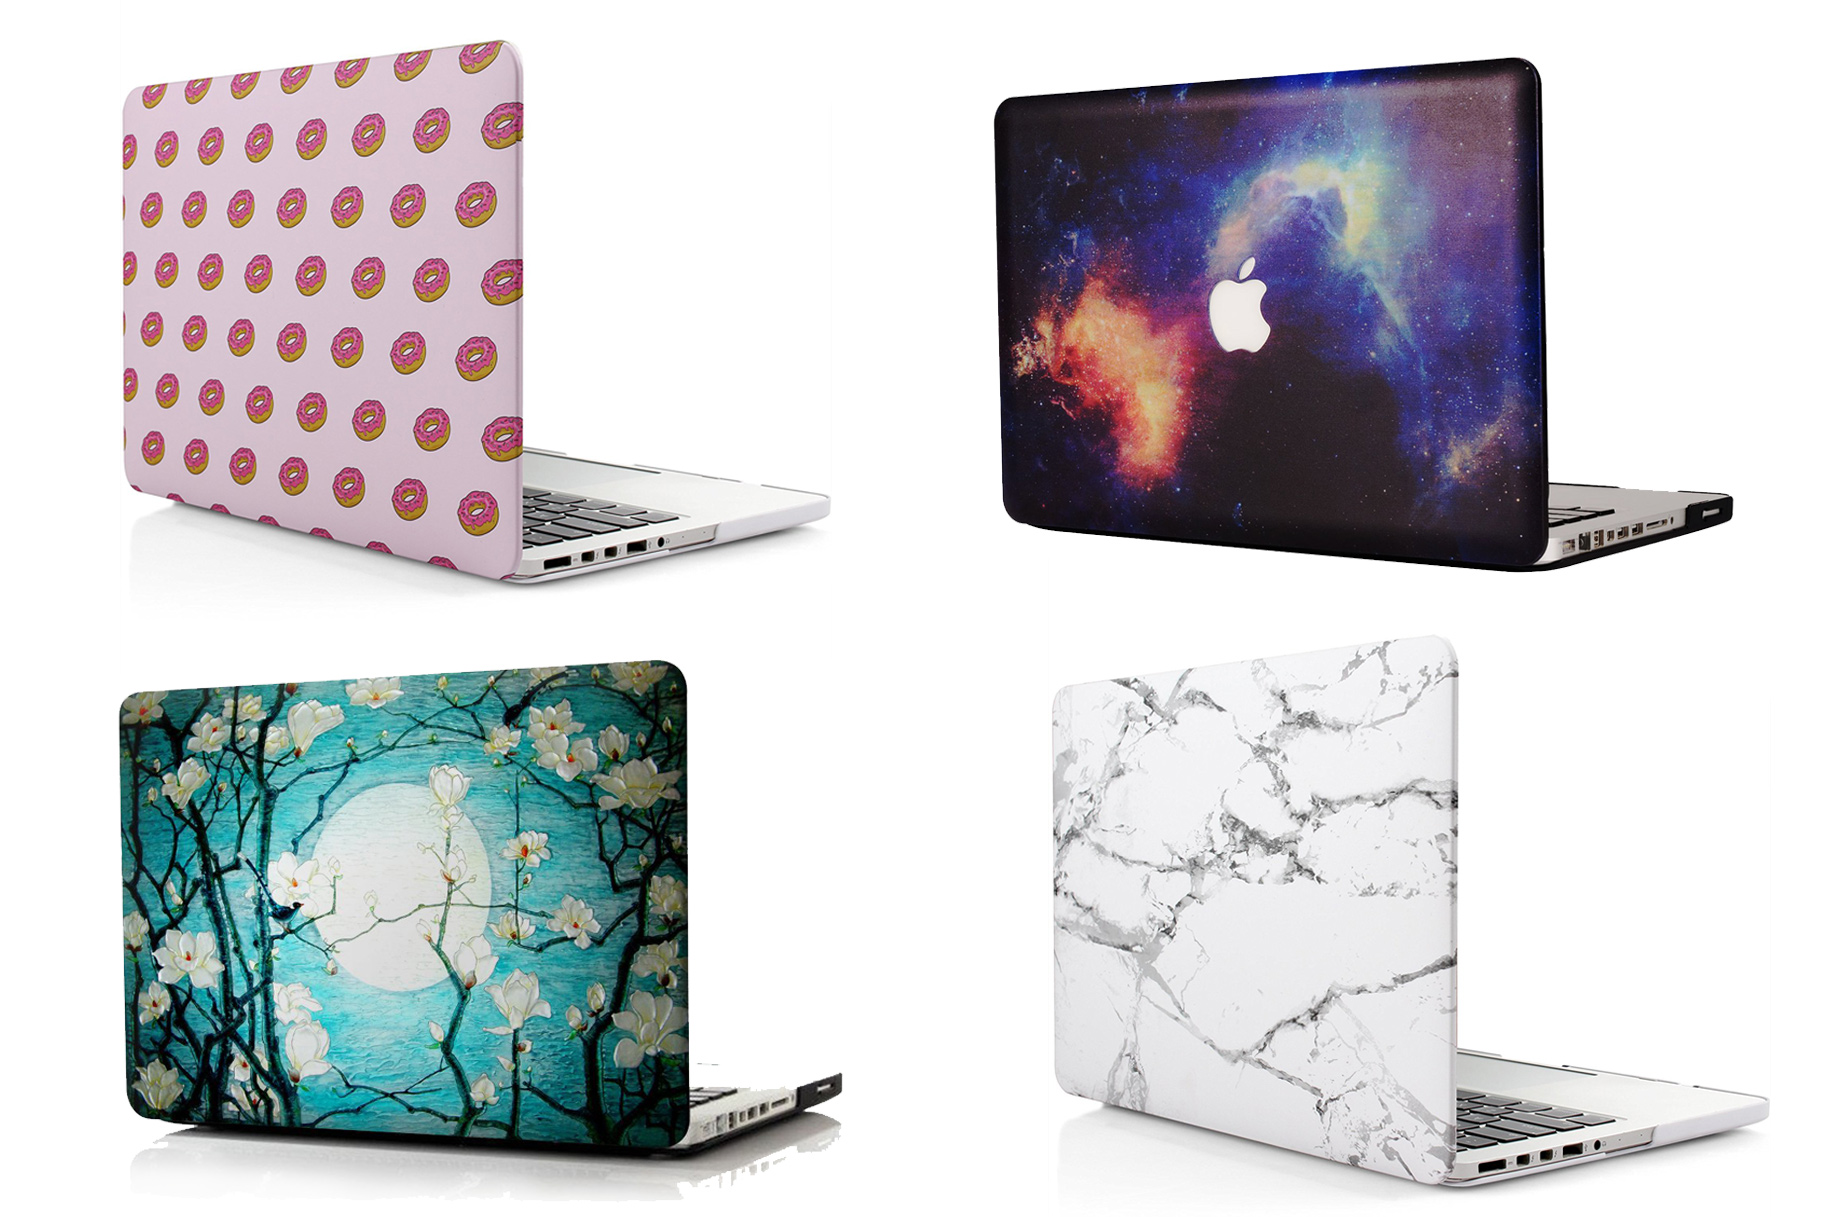 Cute & Pretty Laptop Covers | Home & Design